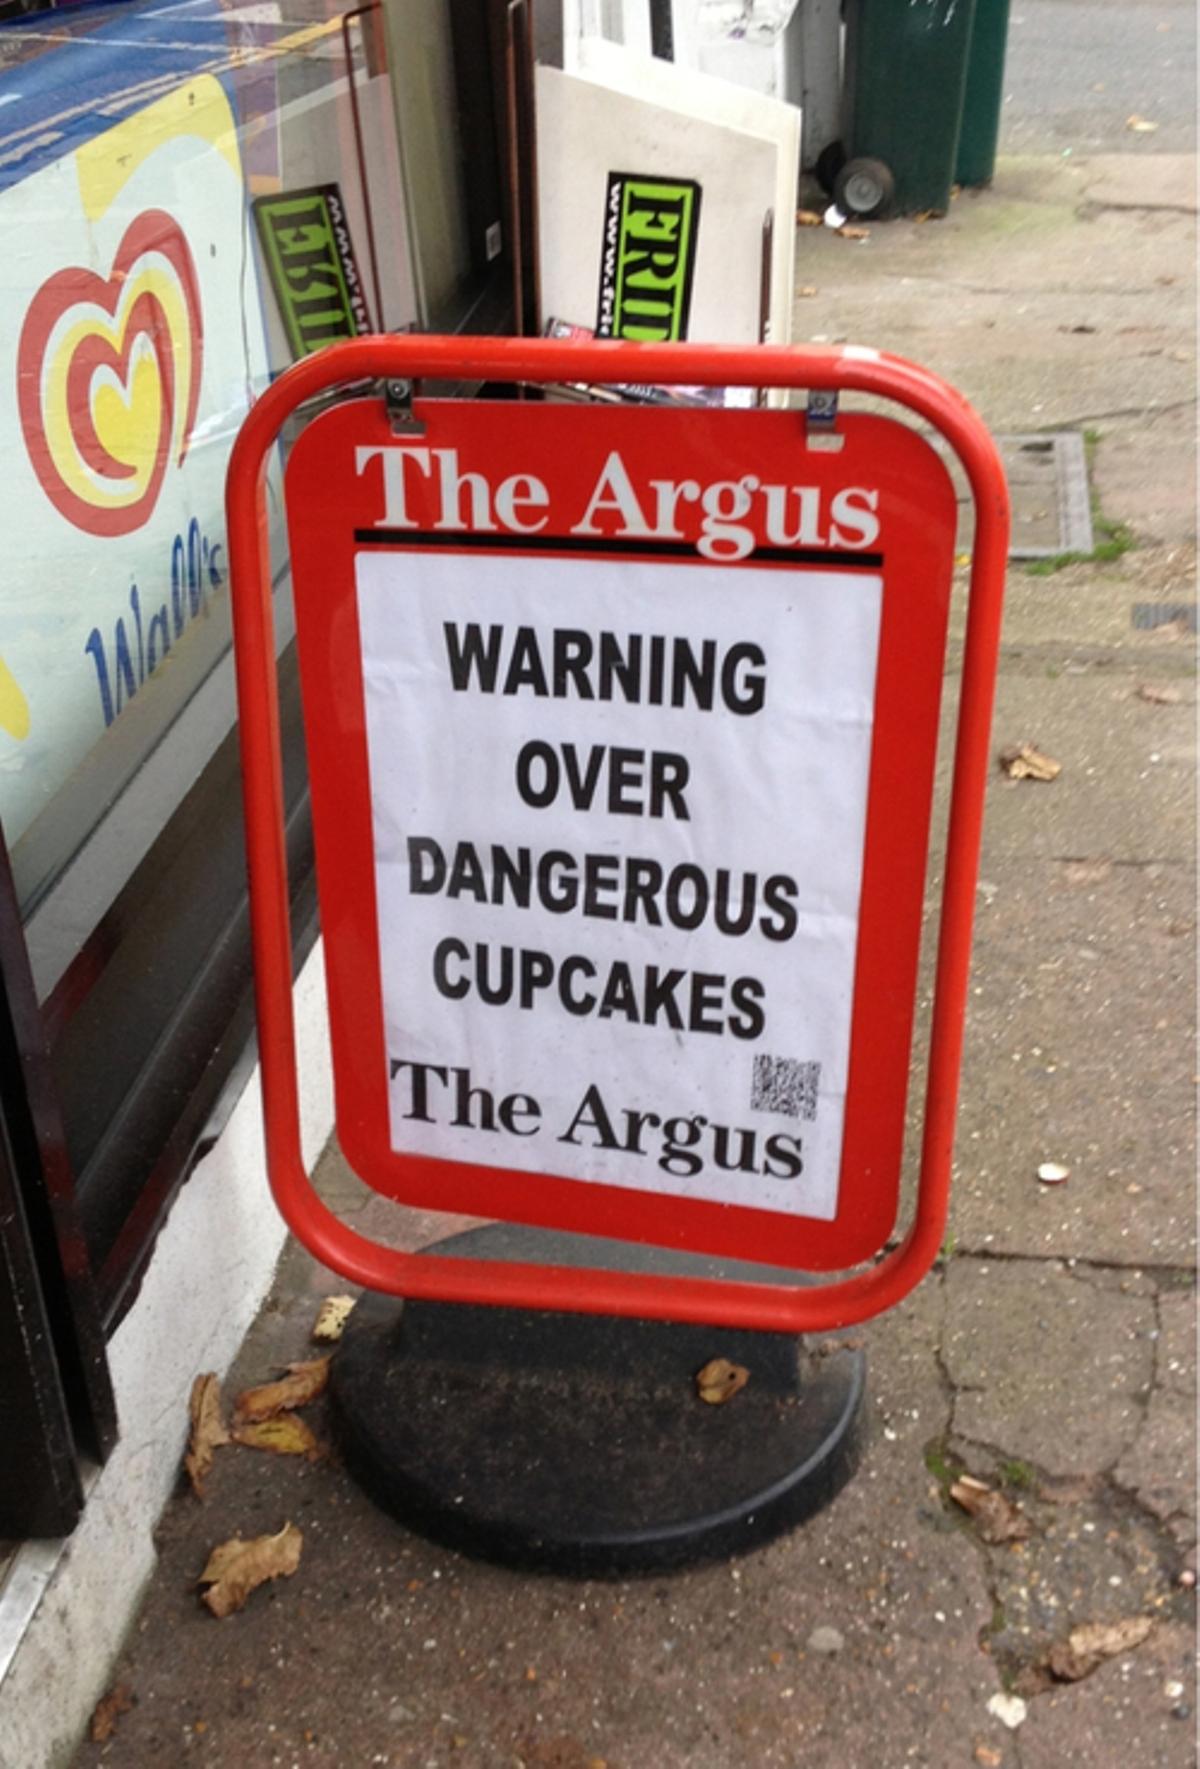 Brighton argus headlines for dating